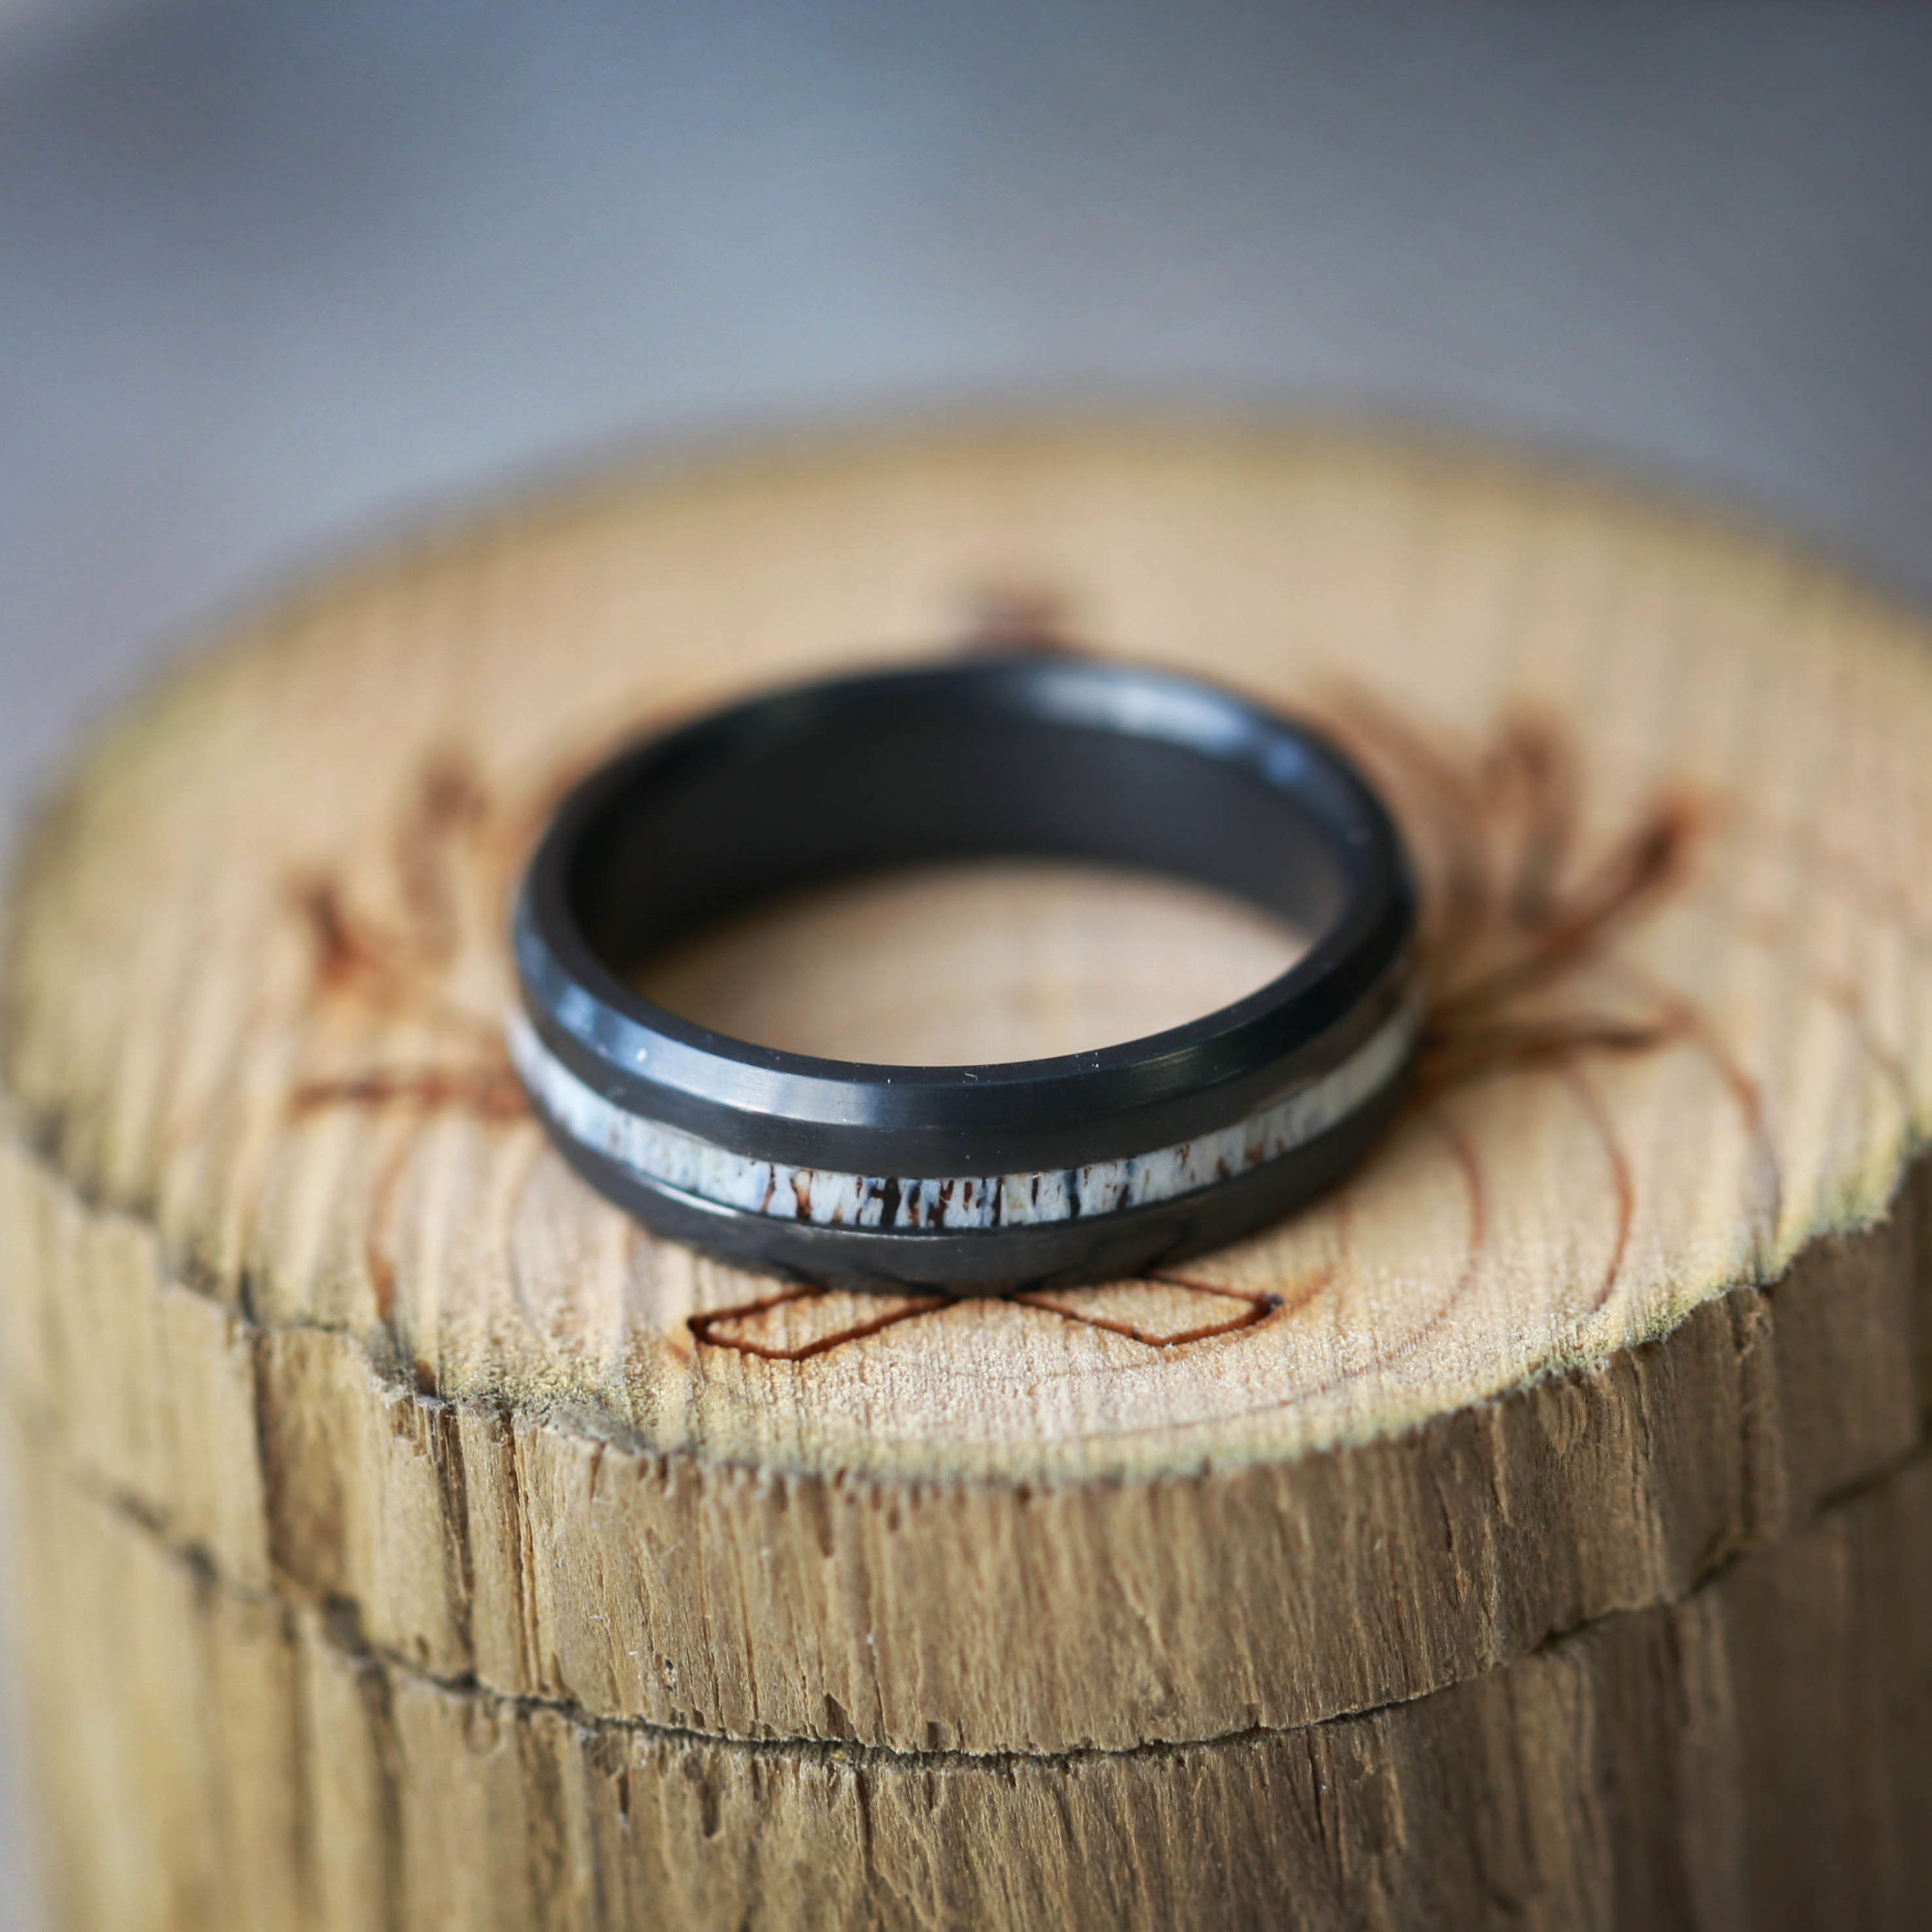 woodandantlerringscontinued antler wedding ring ant channel blackz FIRE TREATED BLACK ZIRCONIUM ELK ANTLER WEDDING BAND from 00